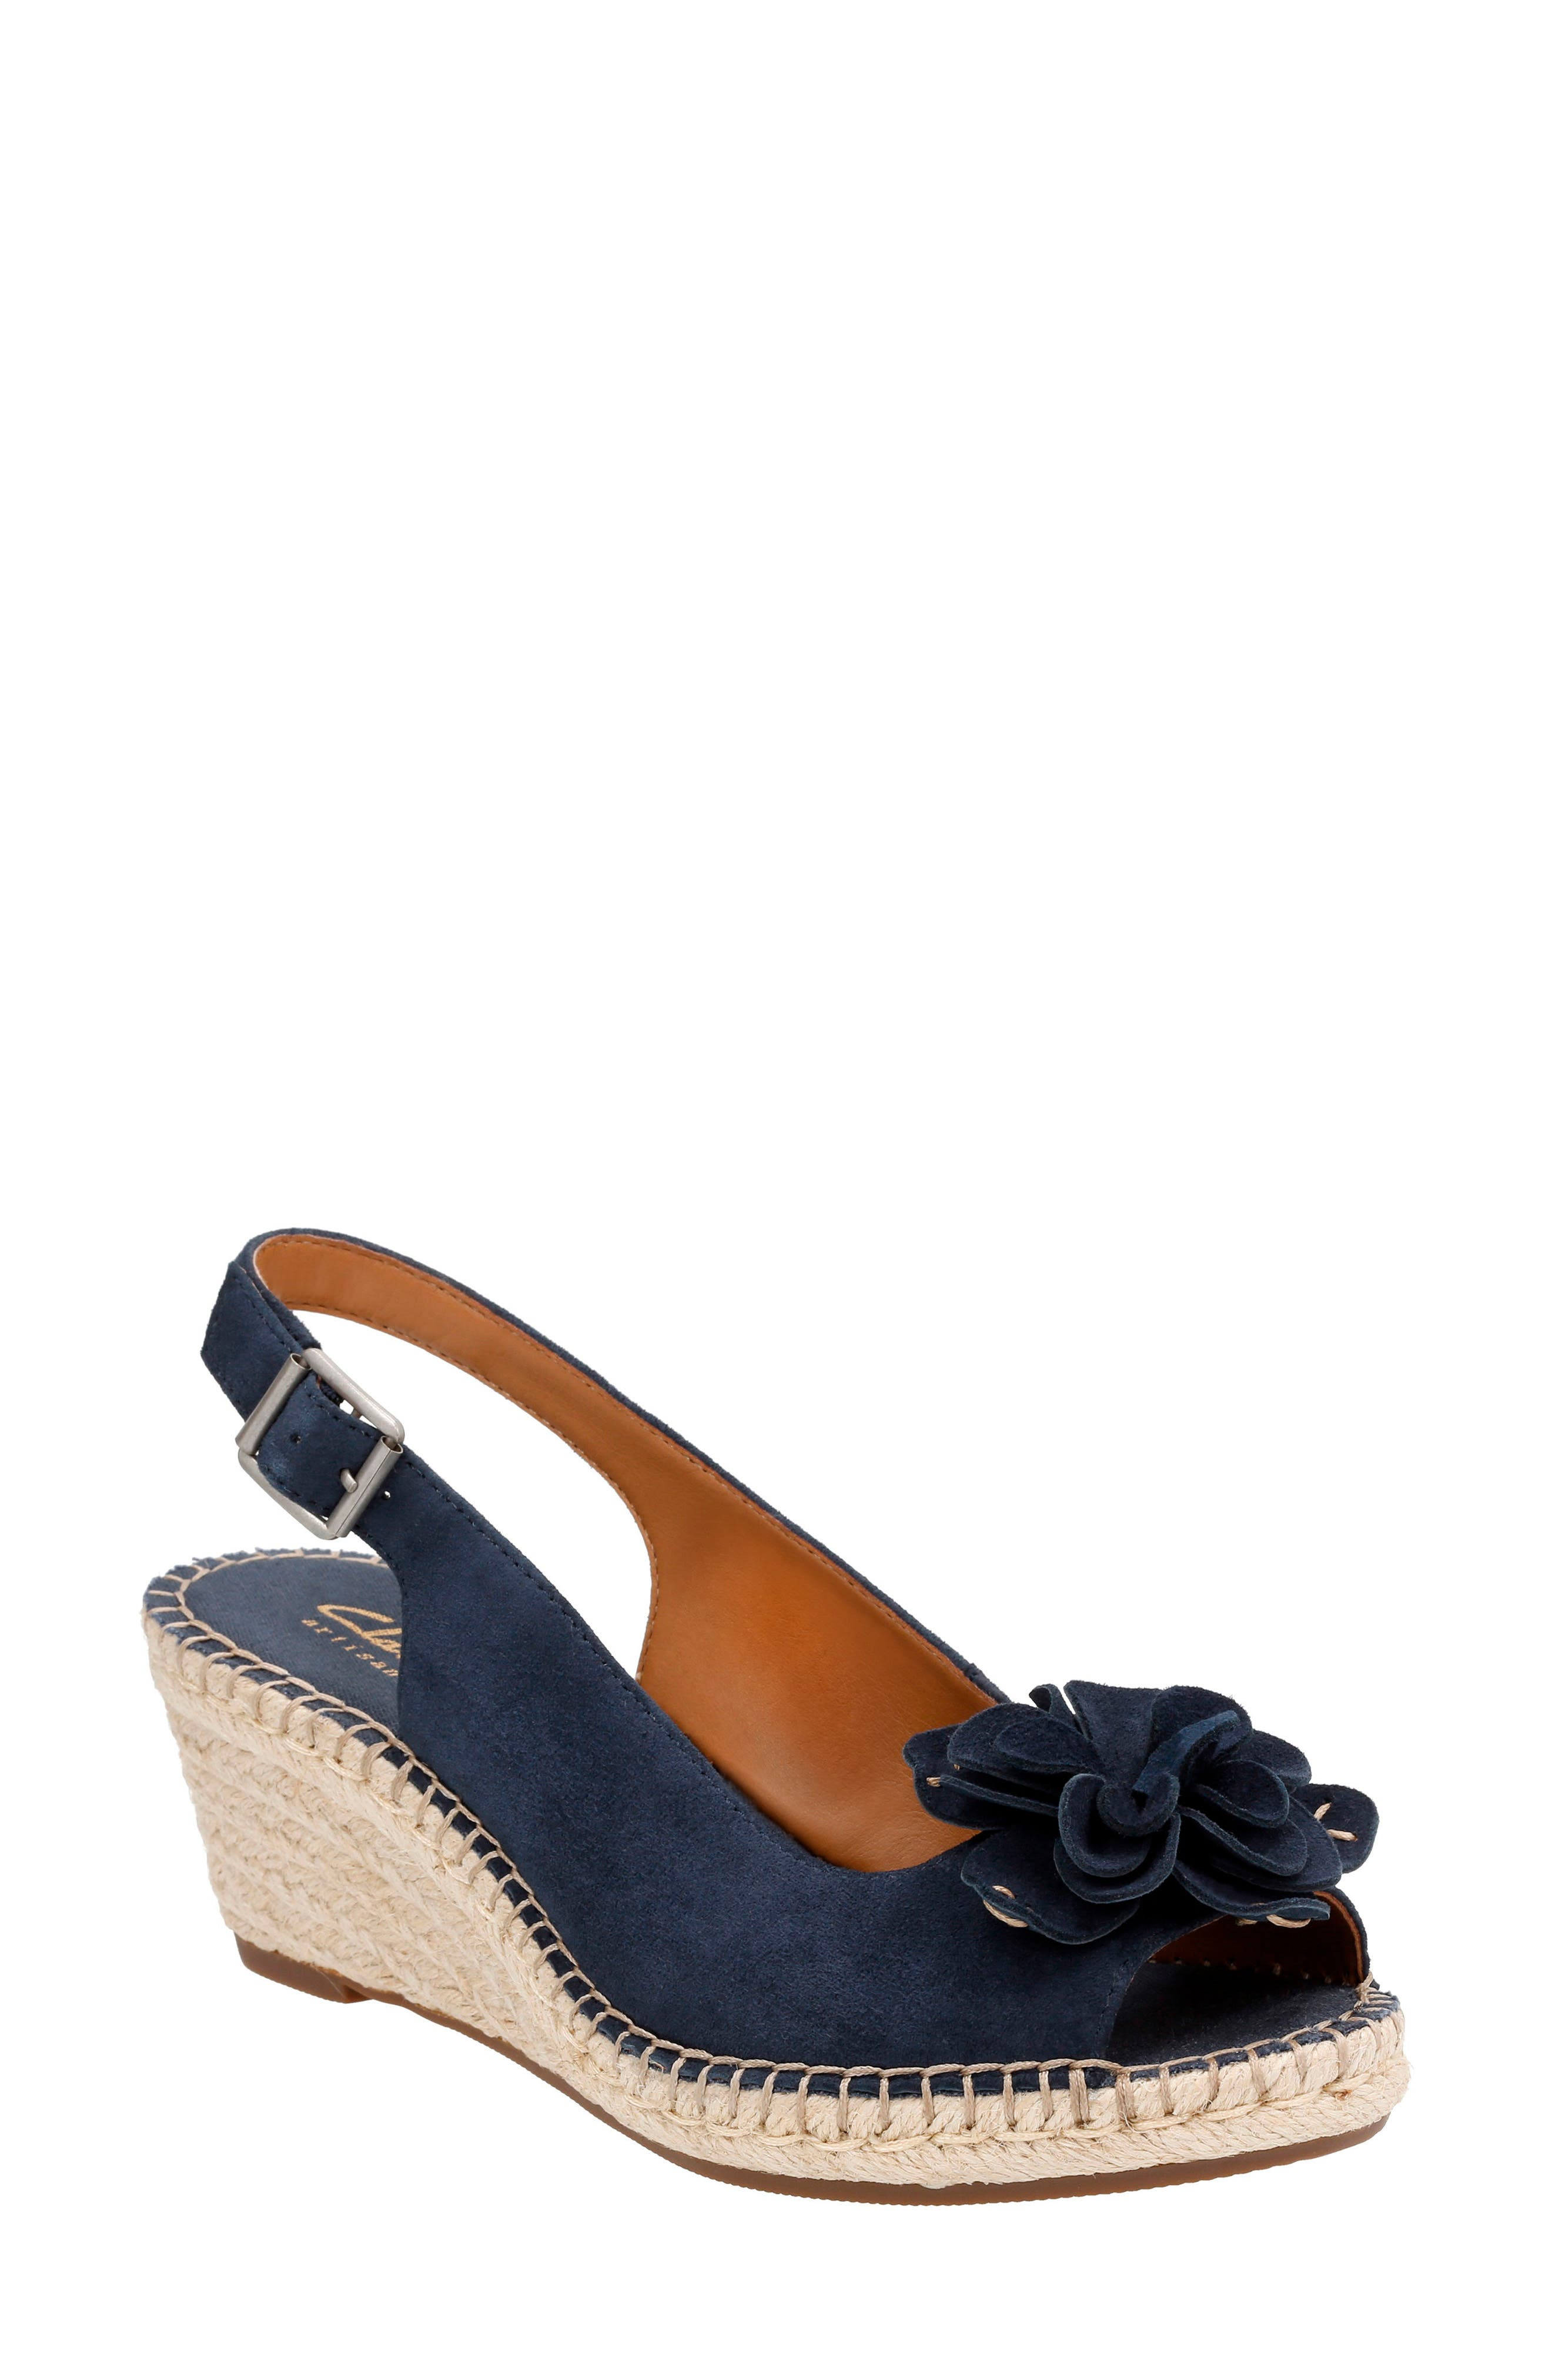 CLARKS® Petrina Bianca Wedge Sandal